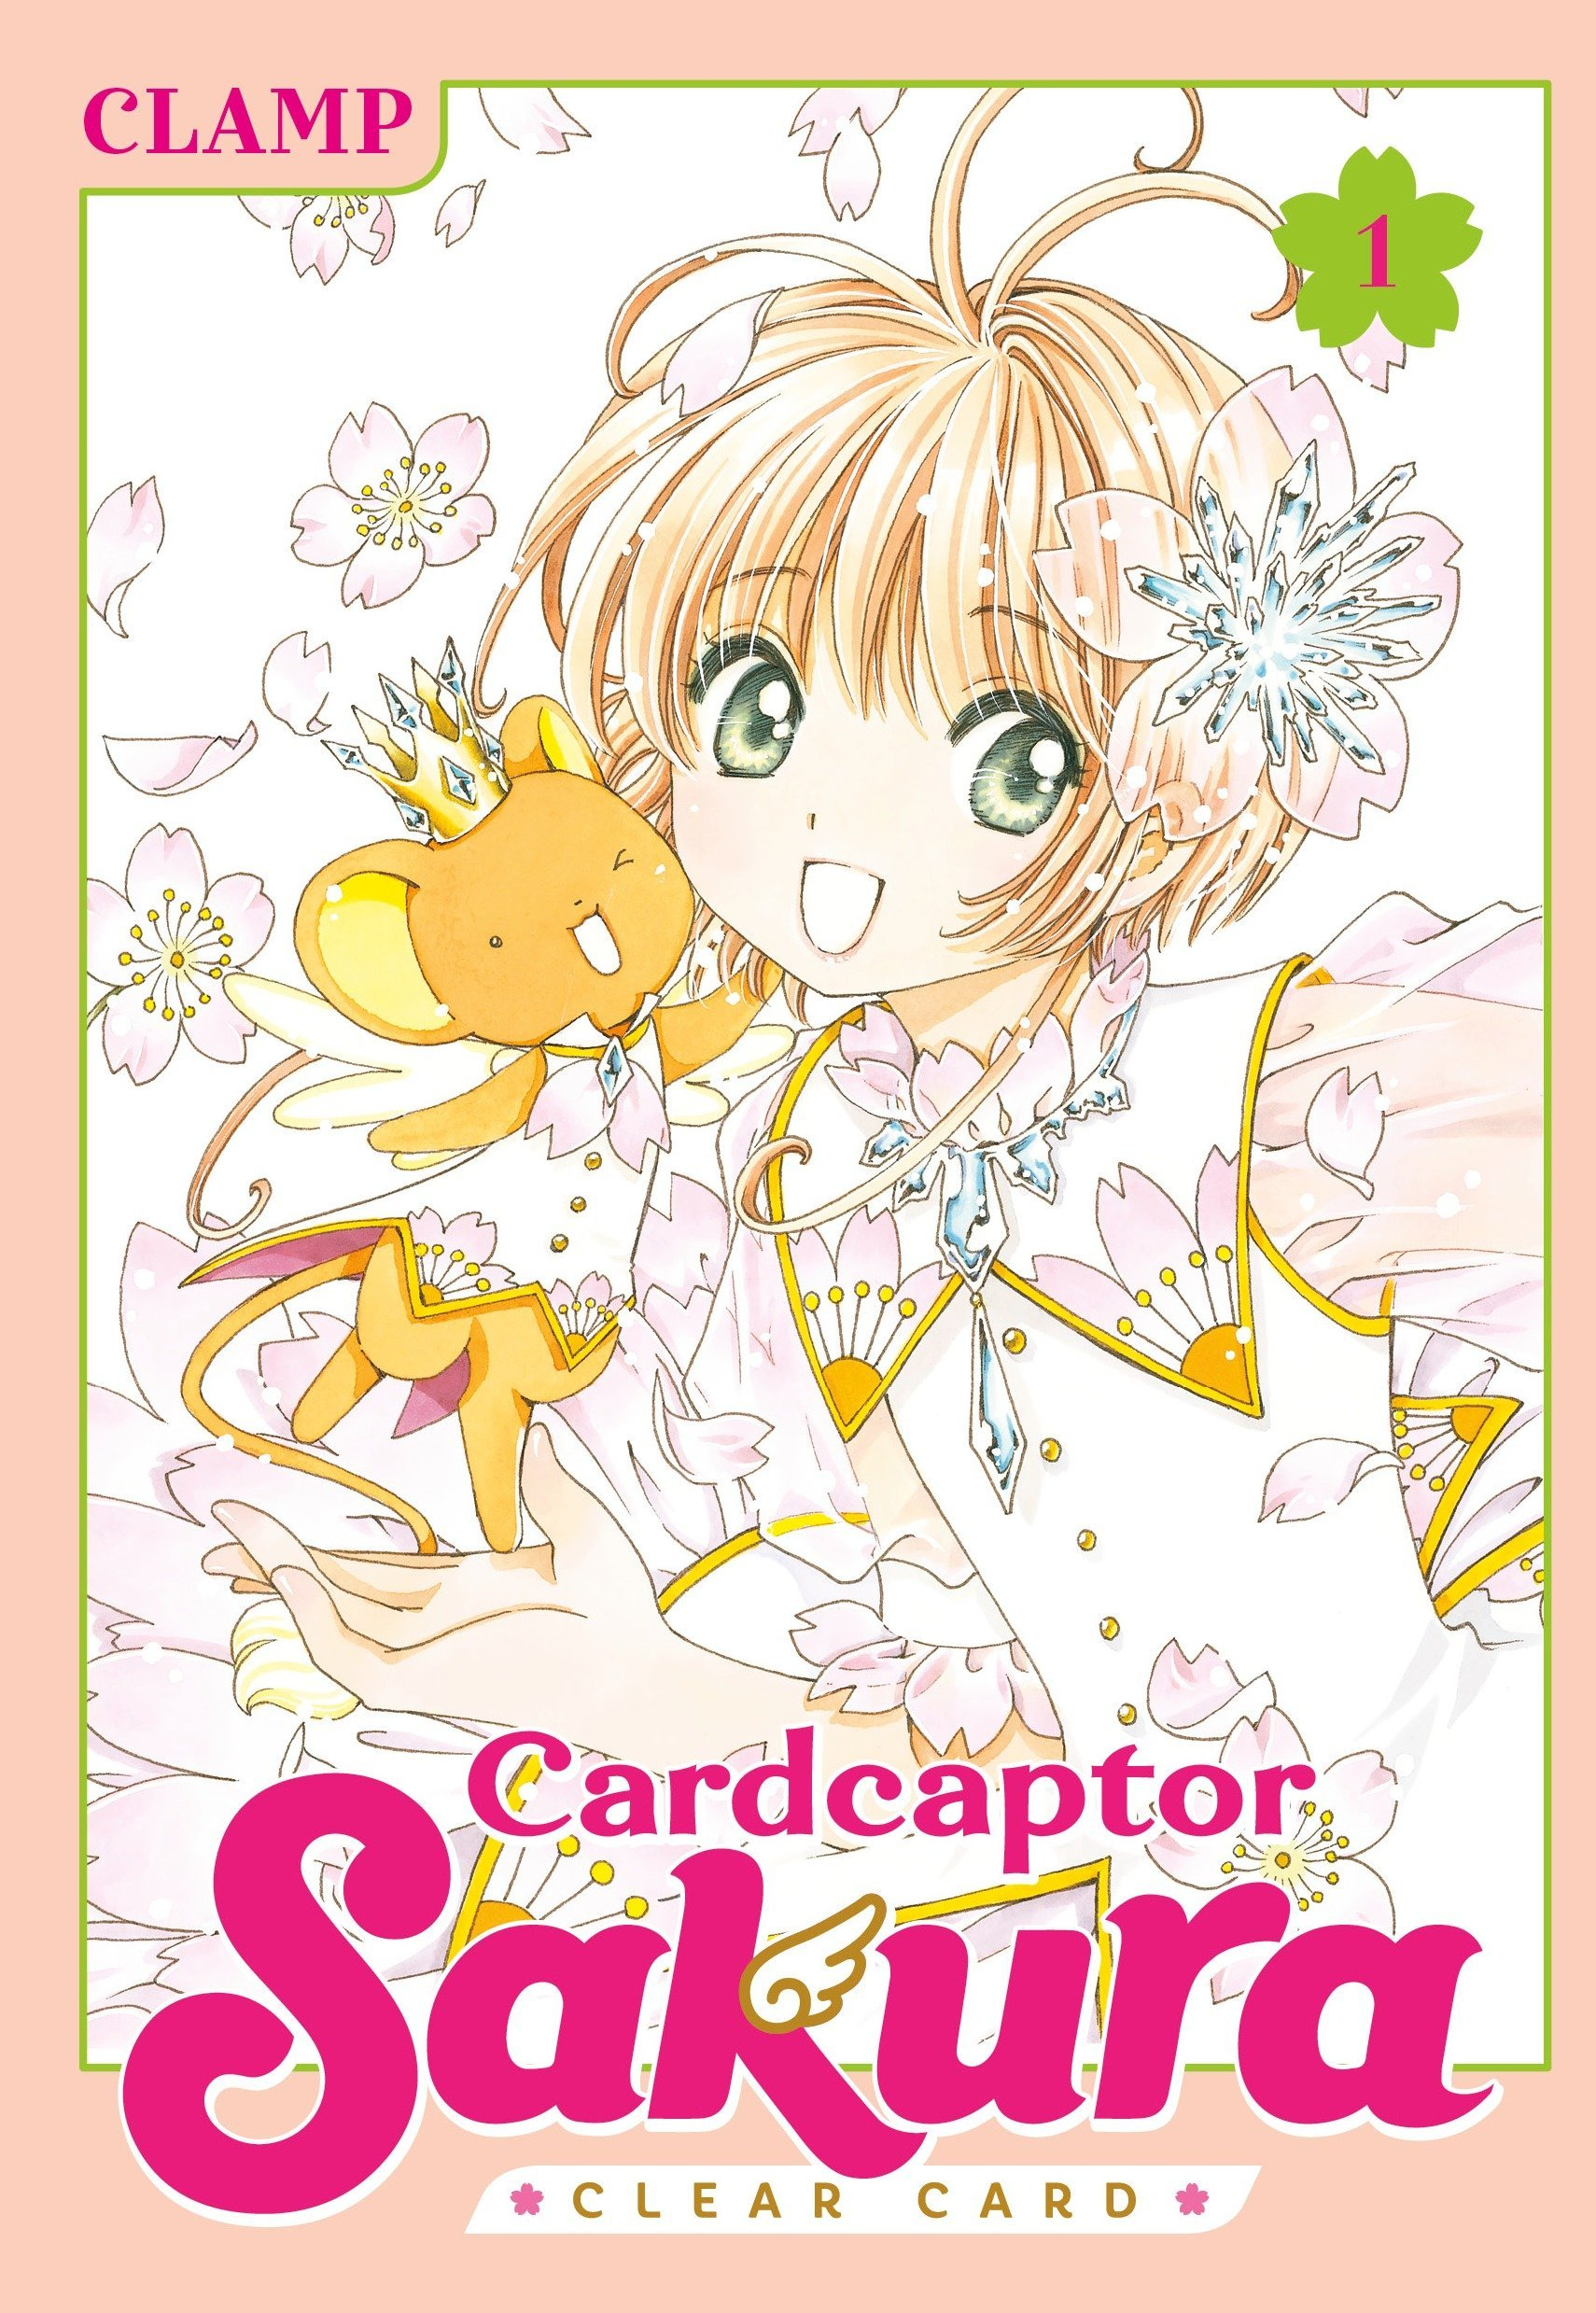 Cardcaptor Sakura Clear Card | Mangá será lançado no Brasil